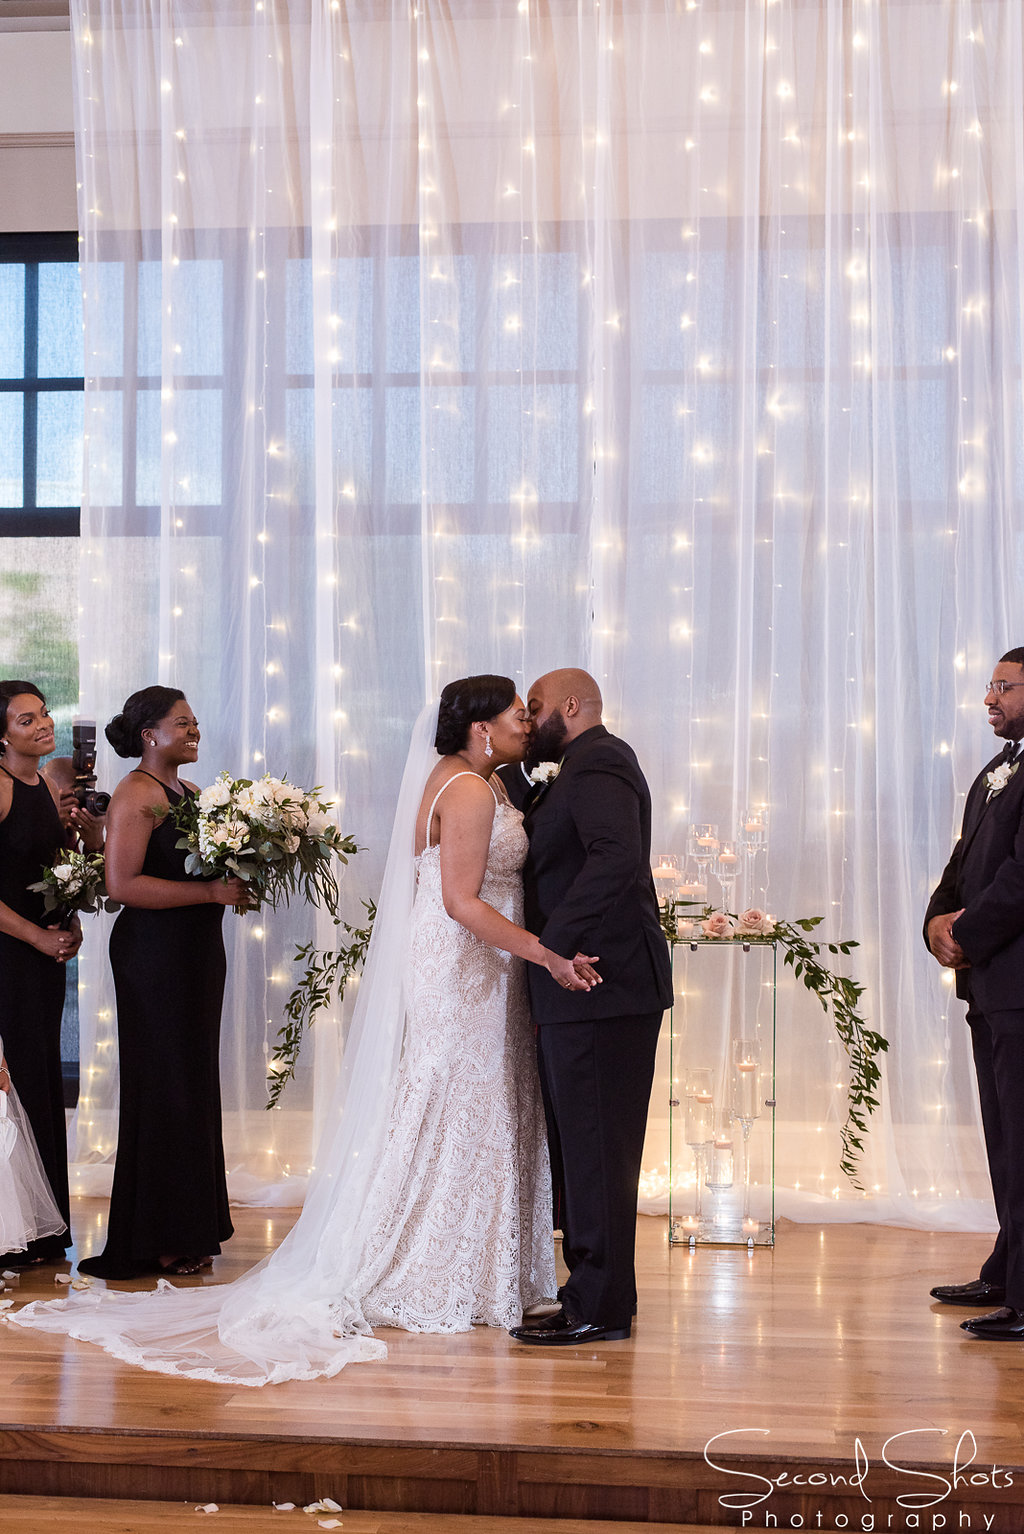 First Kiss Shot| Noah's Wedding Venue| Wedding Planning in Houston